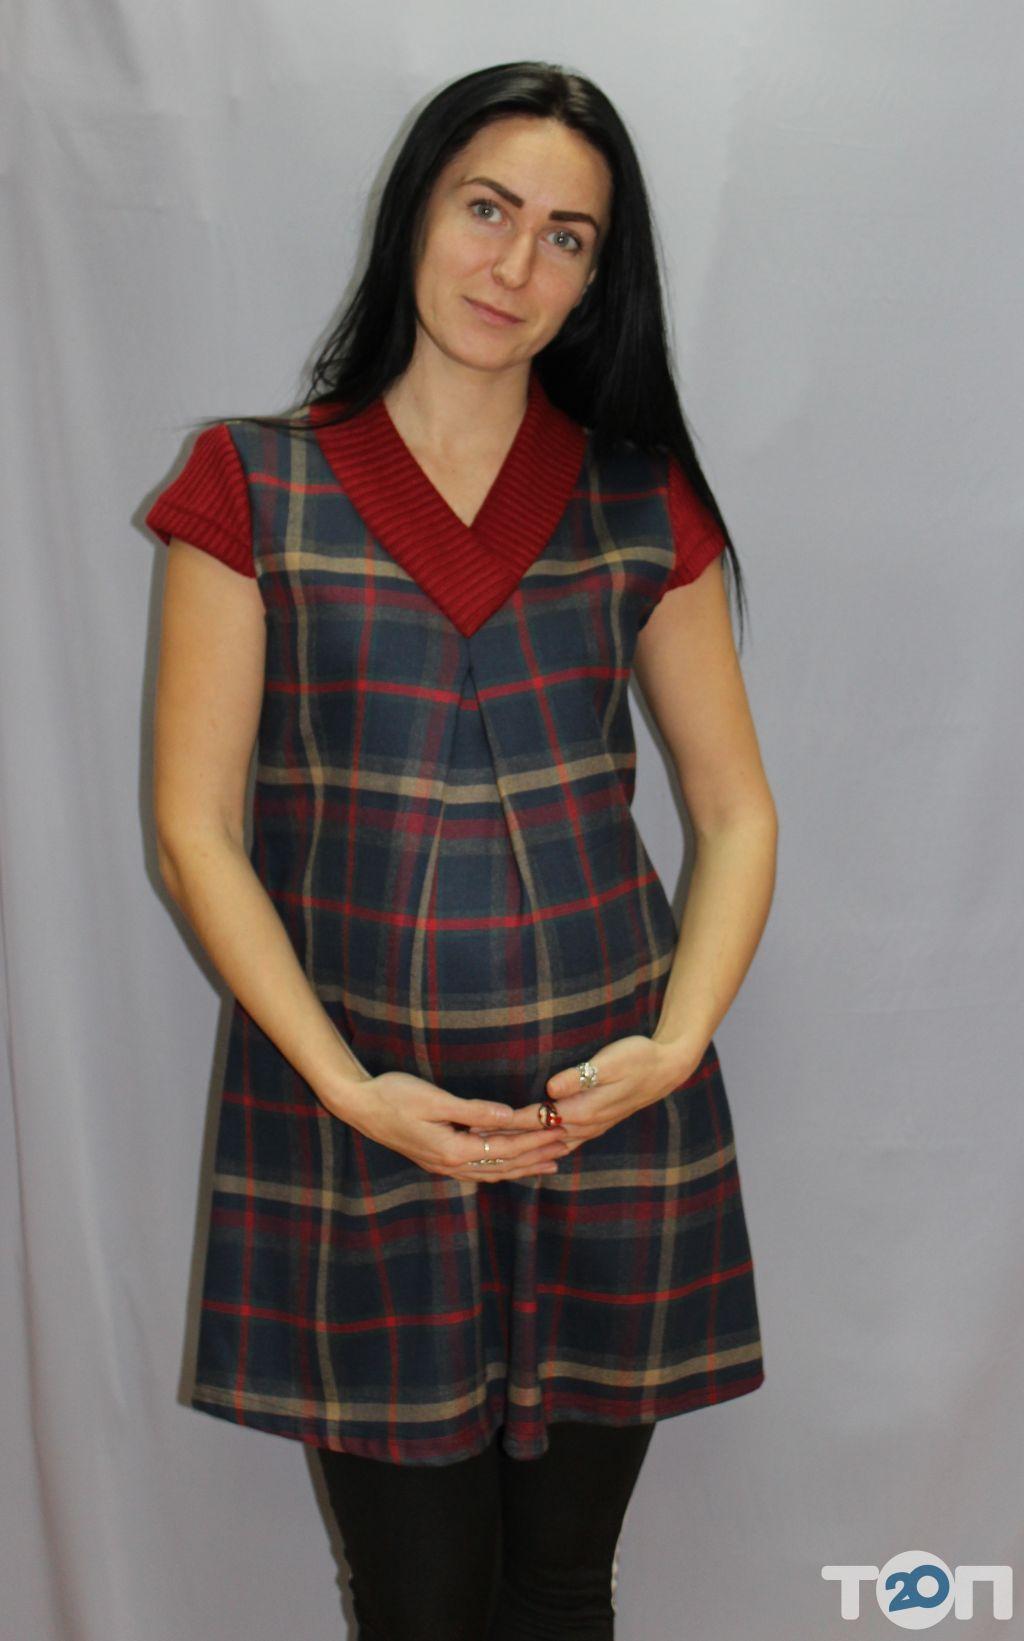 Дануся, одежда для беременных - фото 14